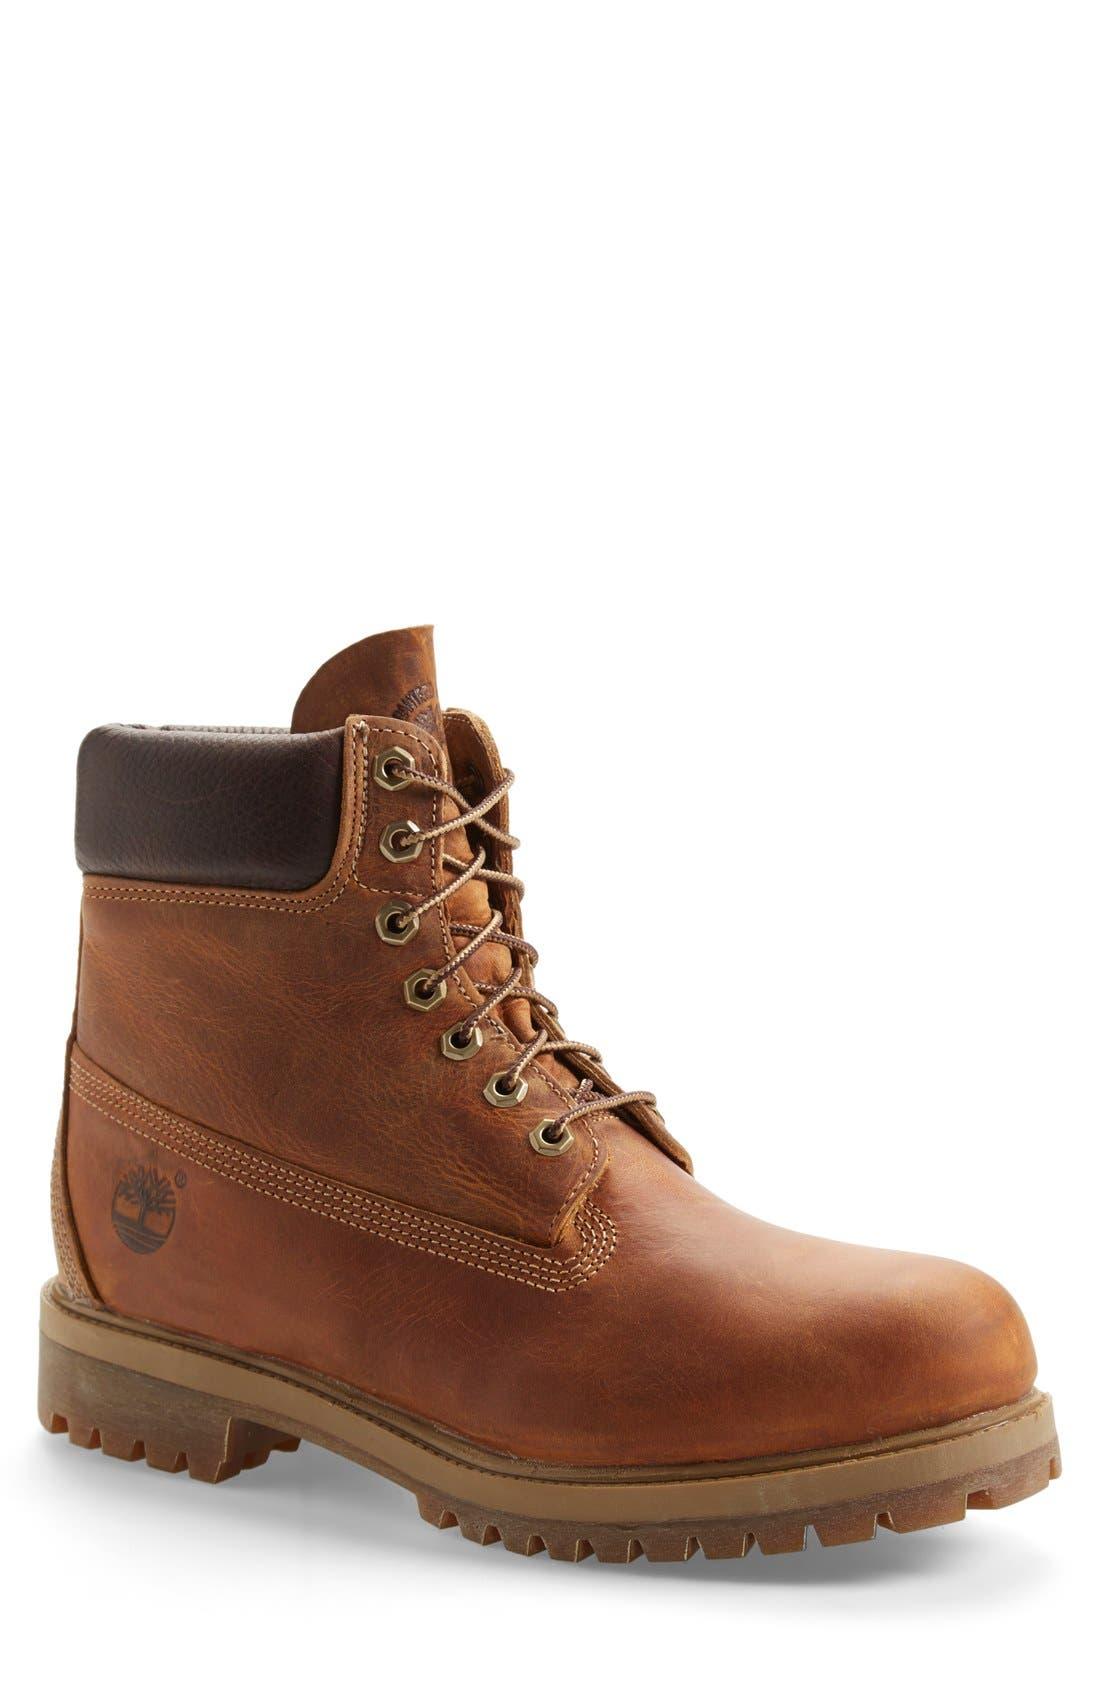 Alternate Image 1 Selected - Timberland 'Premium Heritage' Round Toe Boot  (Men)